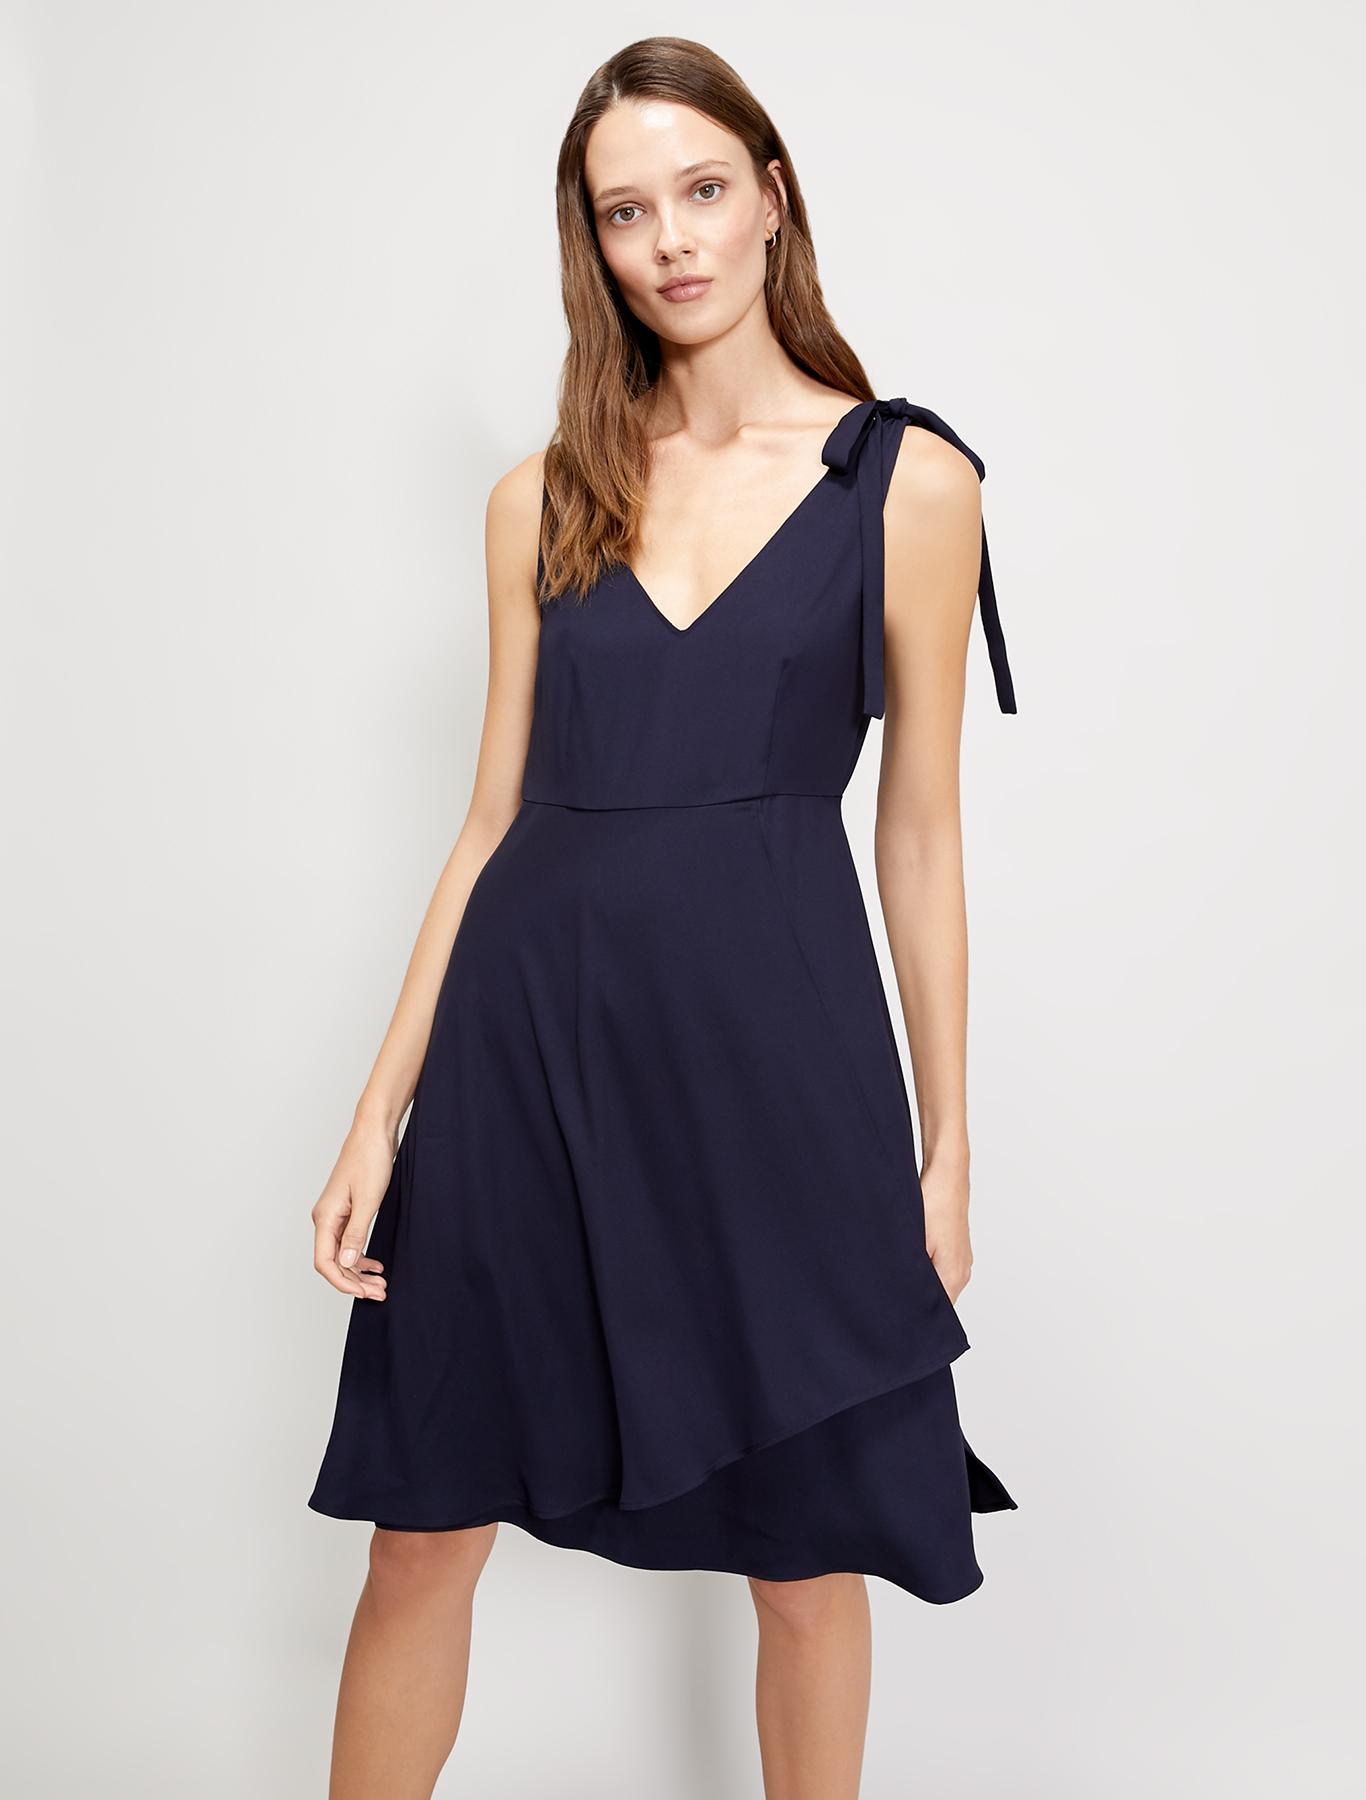 Cady dress with flounce - navy blue - pennyblack